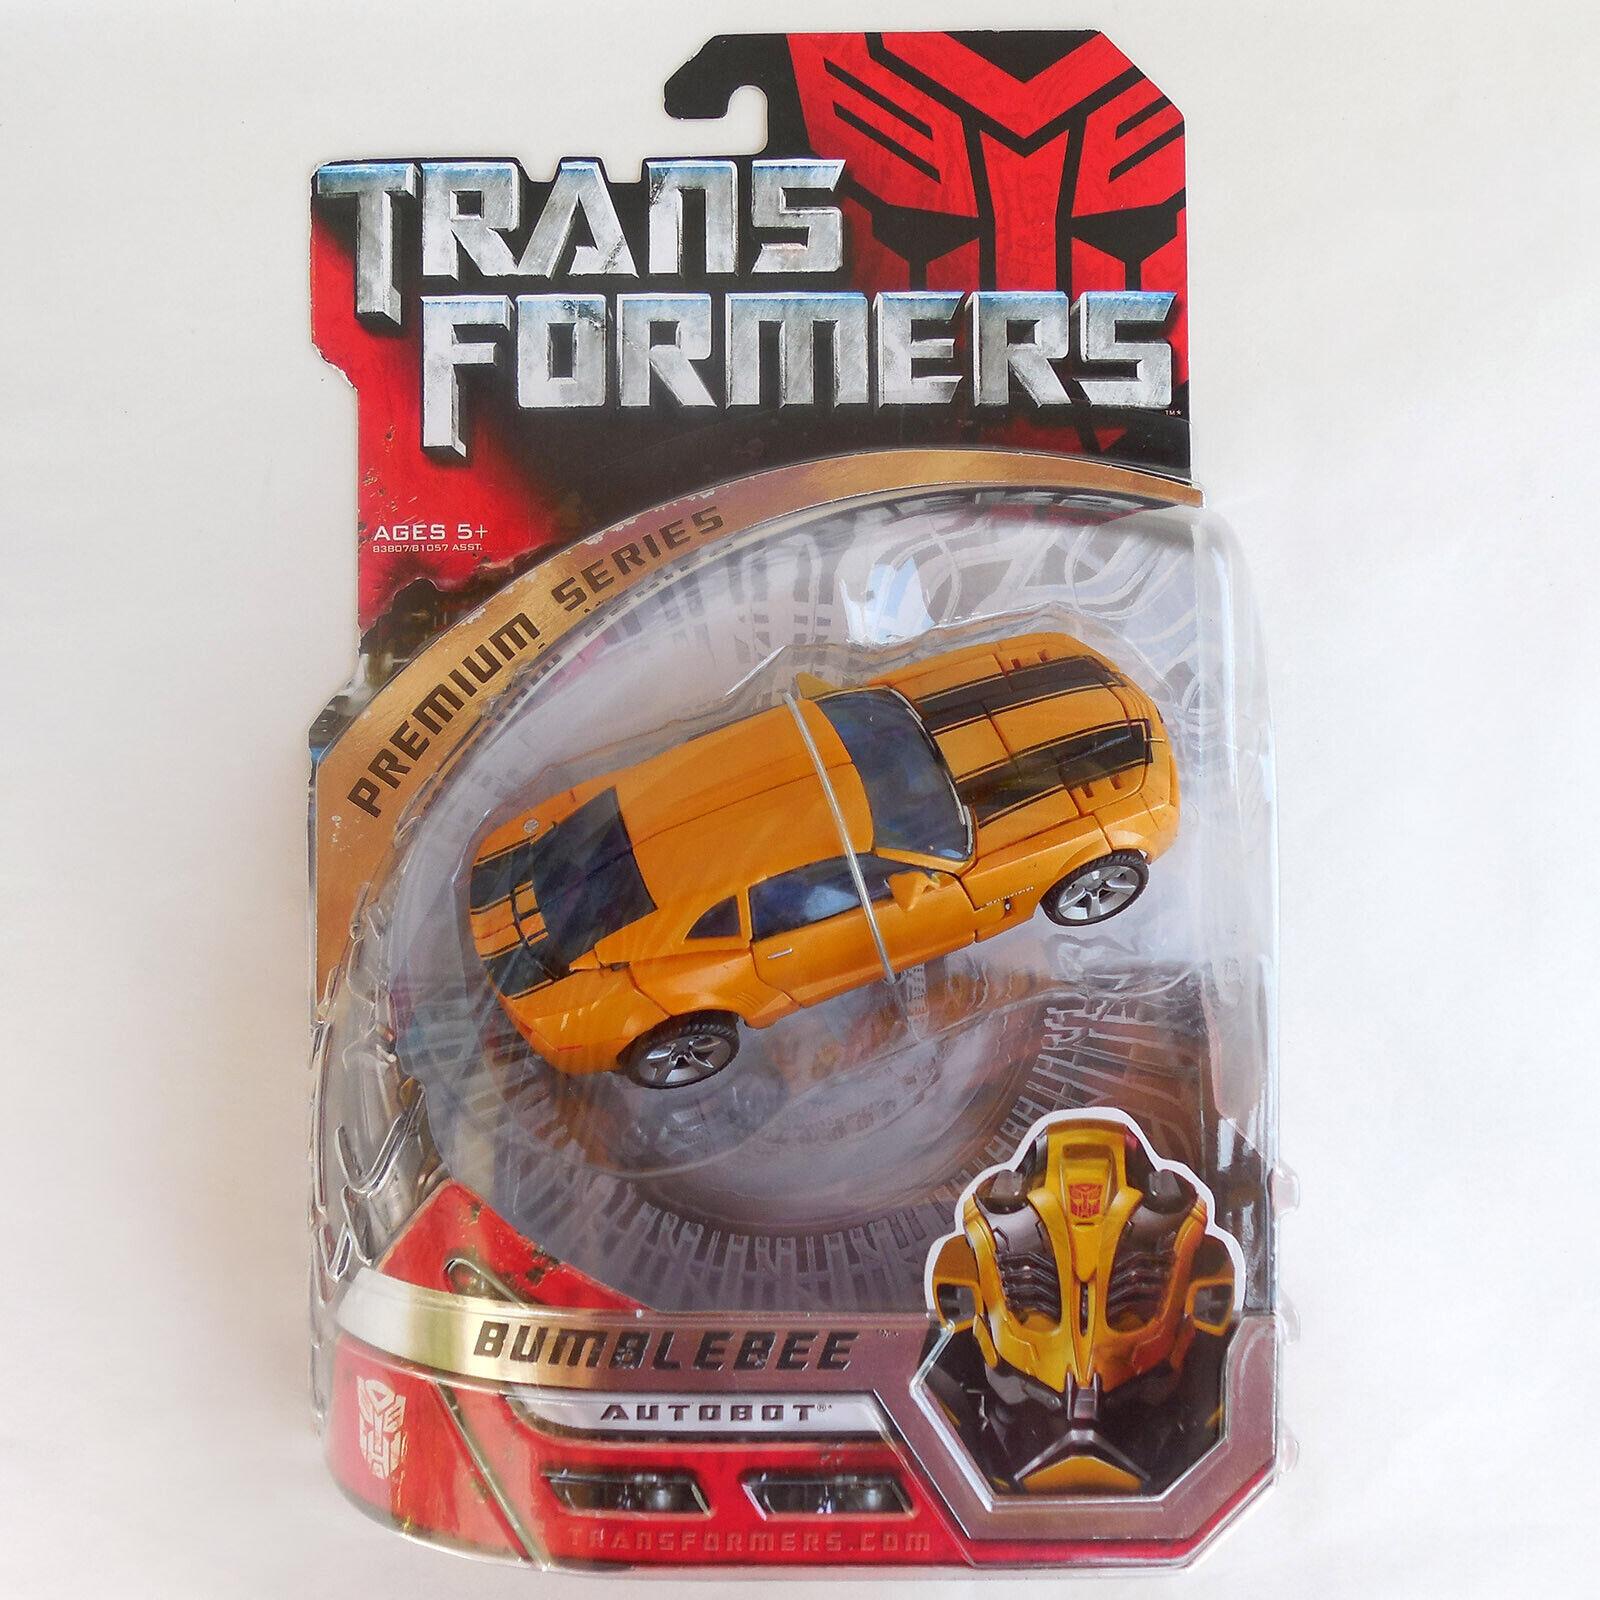 Transformers Movie Premium Series Bumblebee Deluxe Action Figure